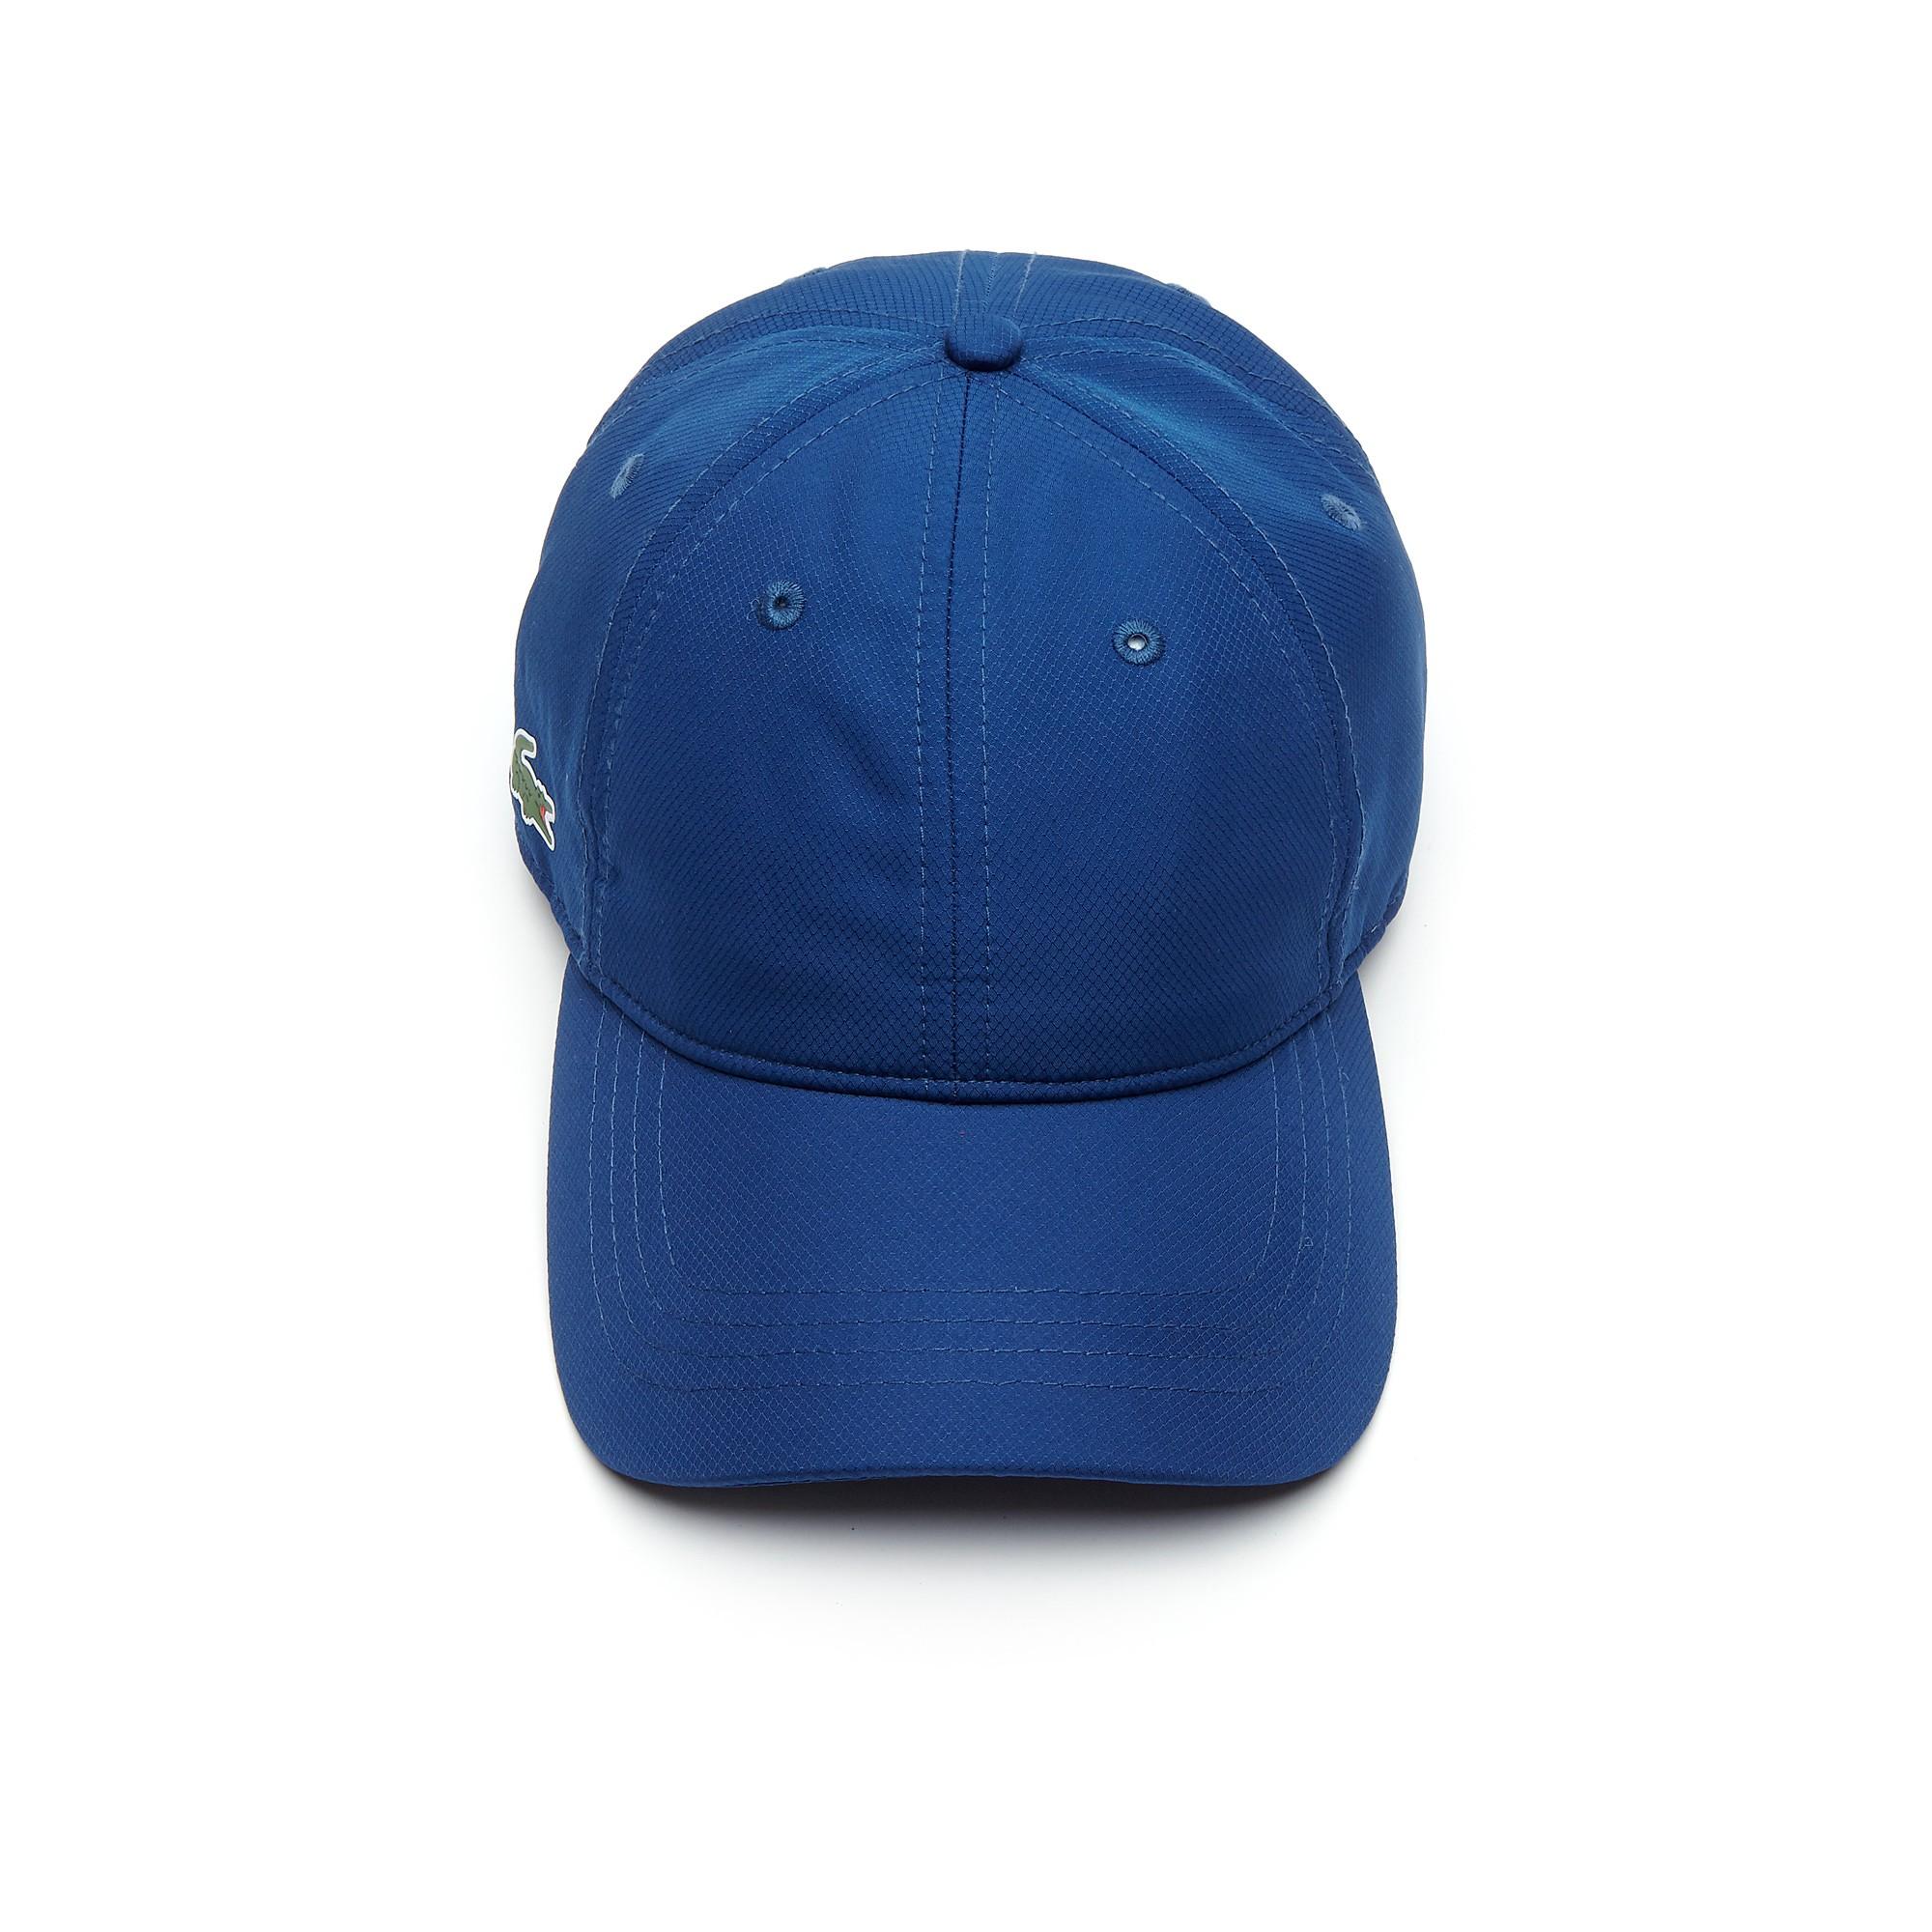 db2c3d56731 Lacoste Men s Sport Cap In Solid Diamond Weave Taffeta - Apricot Green